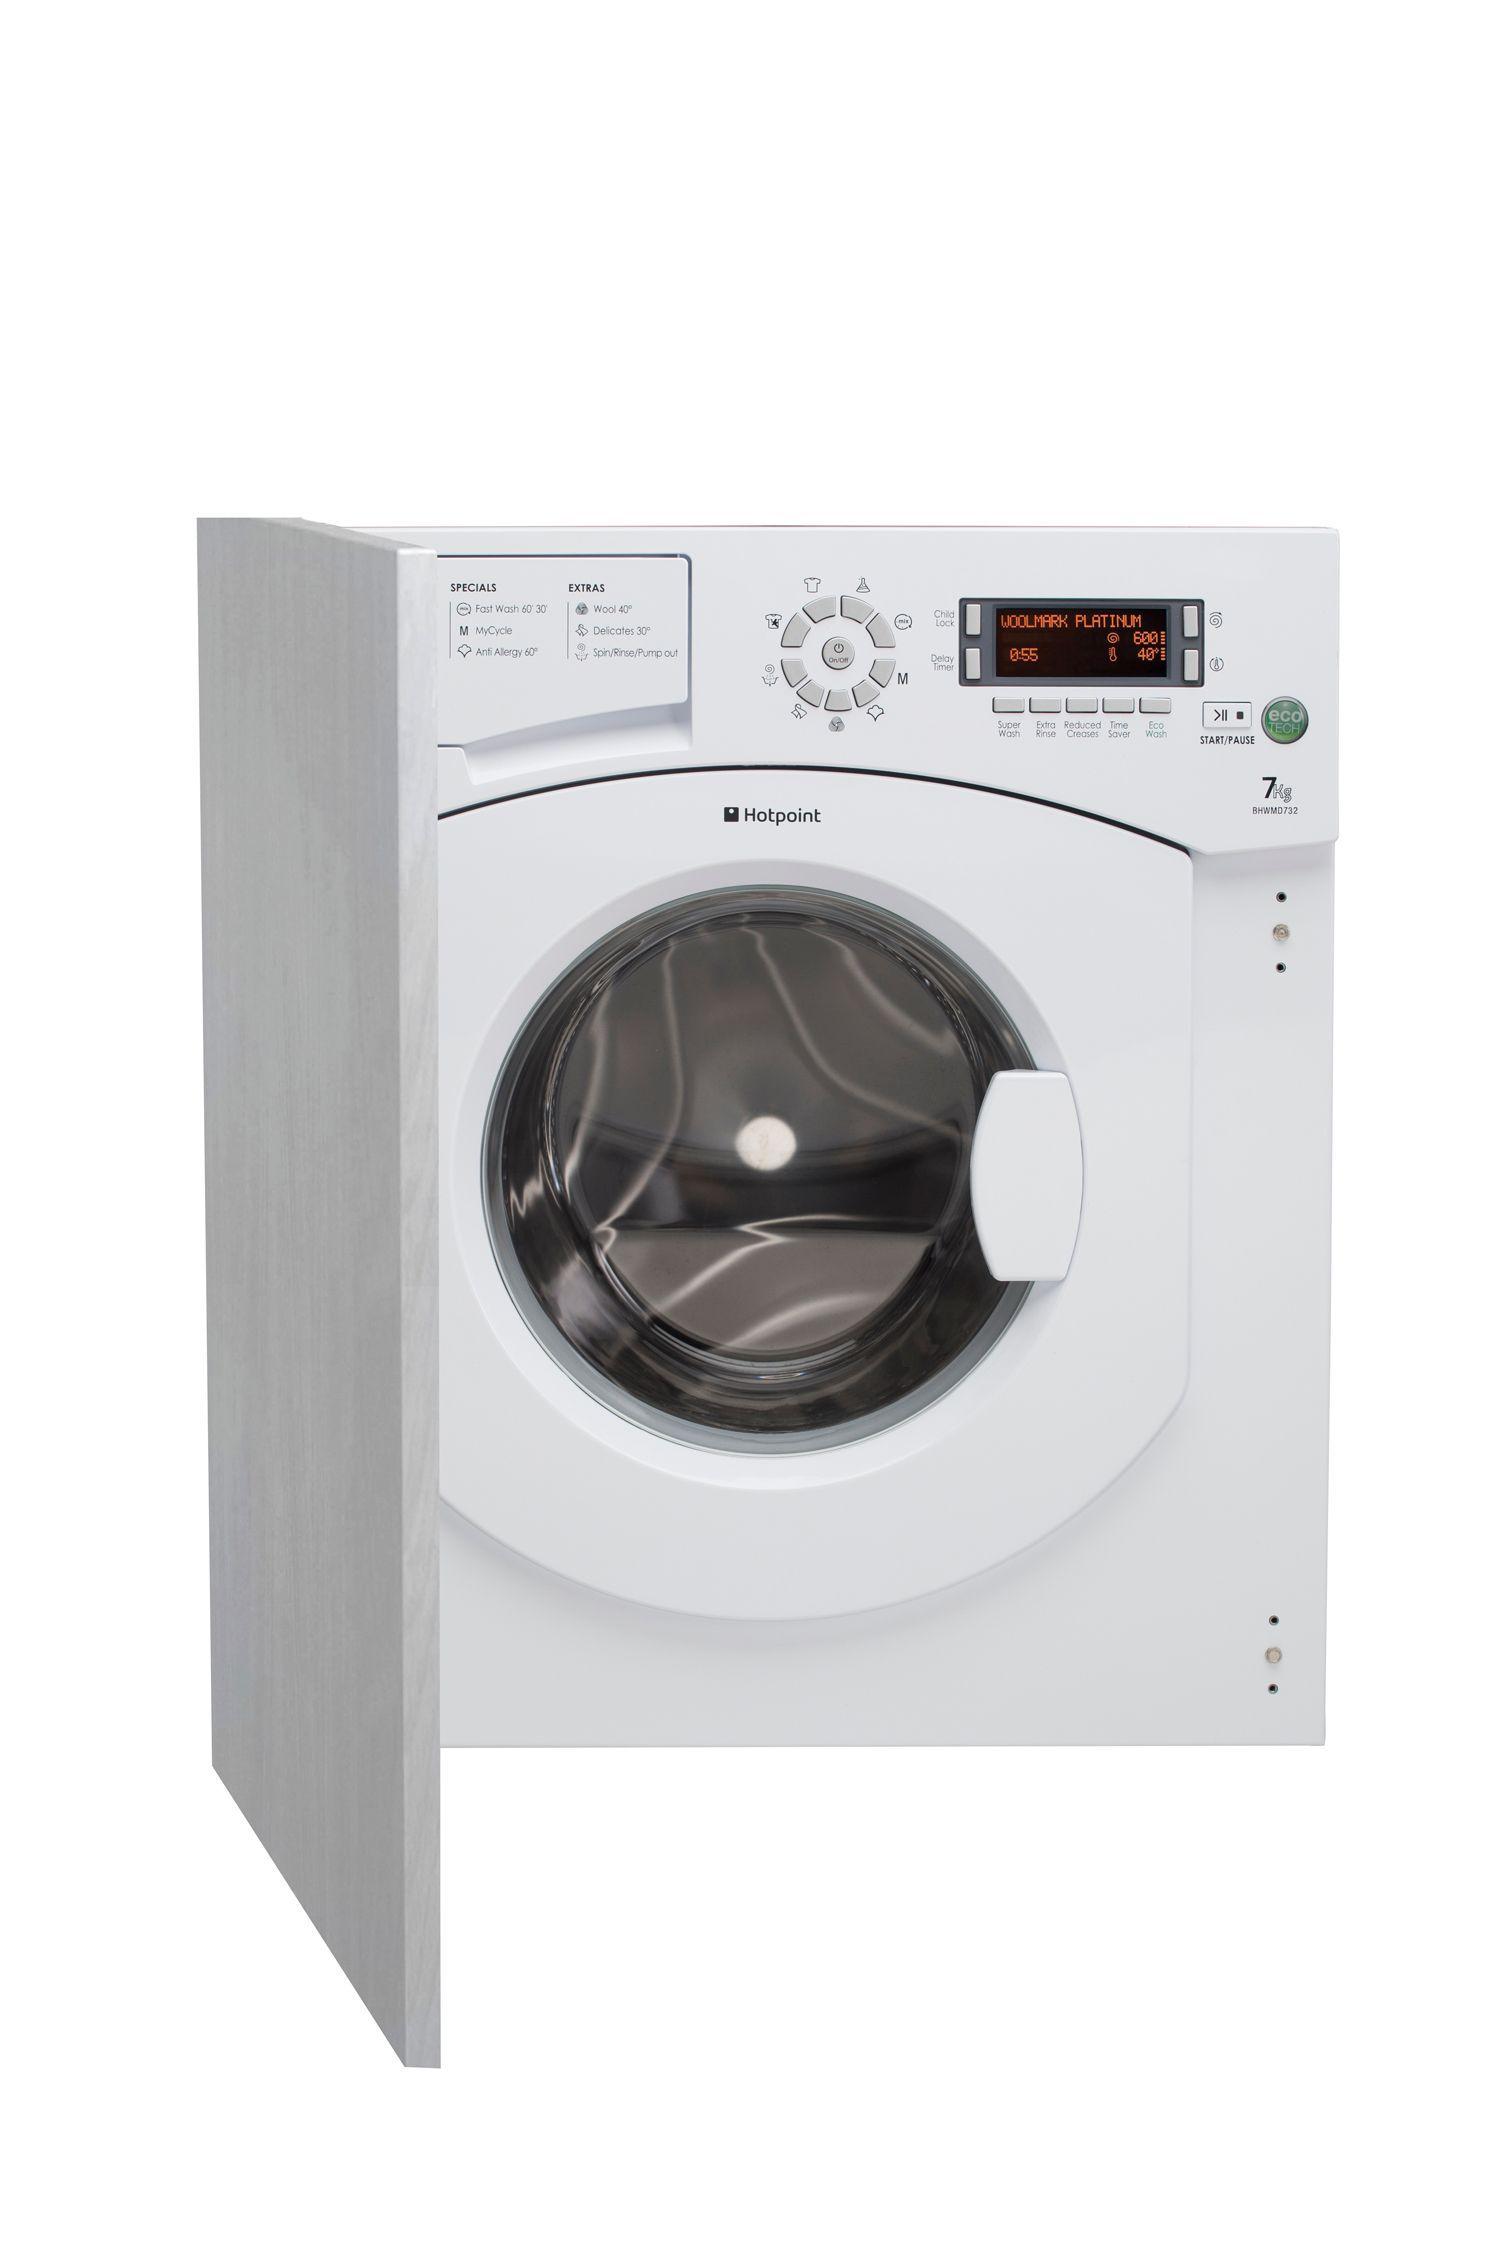 hotpoint bhwmd732 white built in washing machine. Black Bedroom Furniture Sets. Home Design Ideas